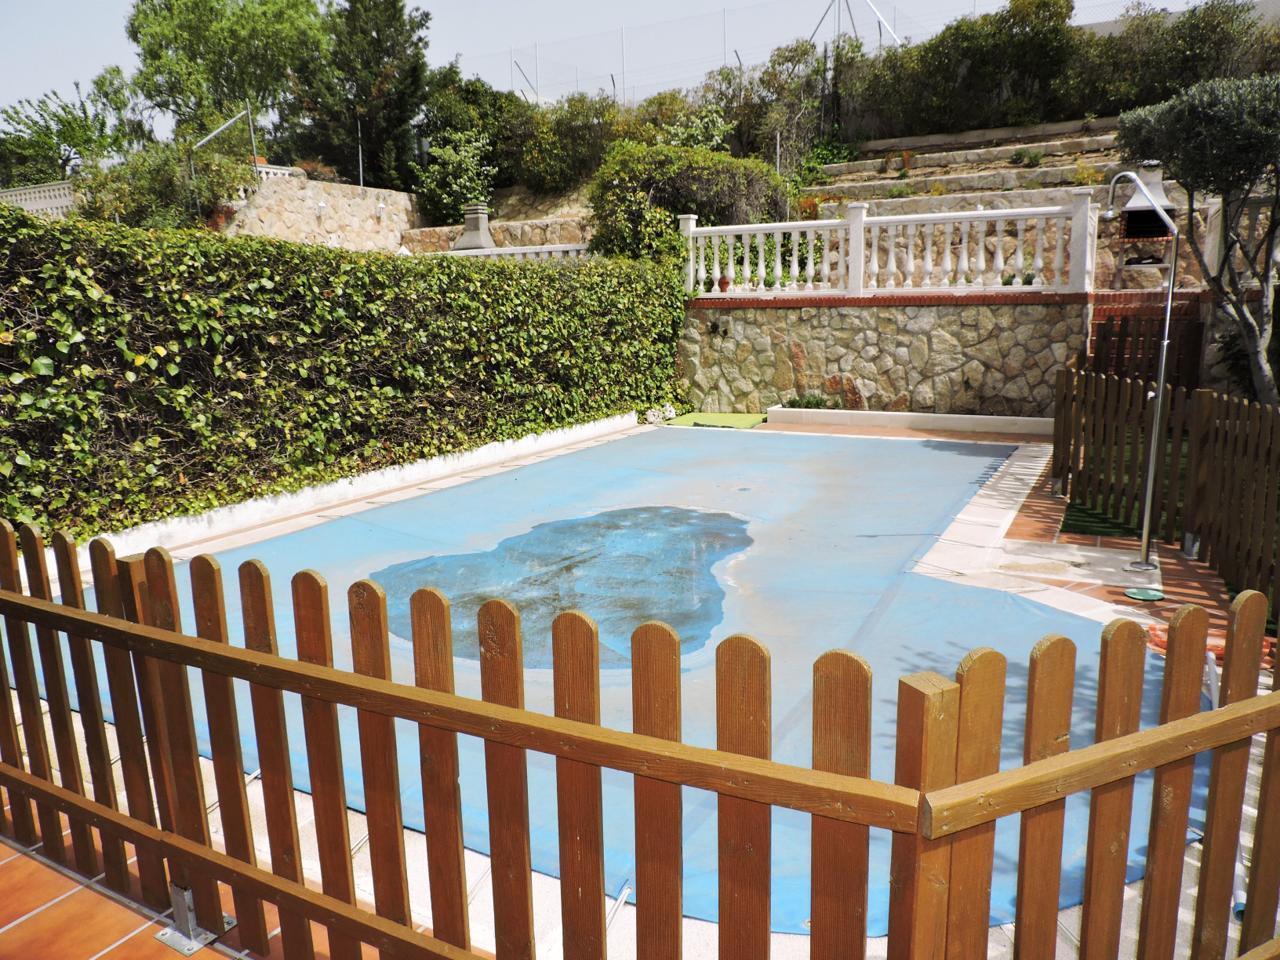 Properties capital real state casa chalet en venta en arroyomolinos de 335 m2 - Casa en arroyomolinos ...